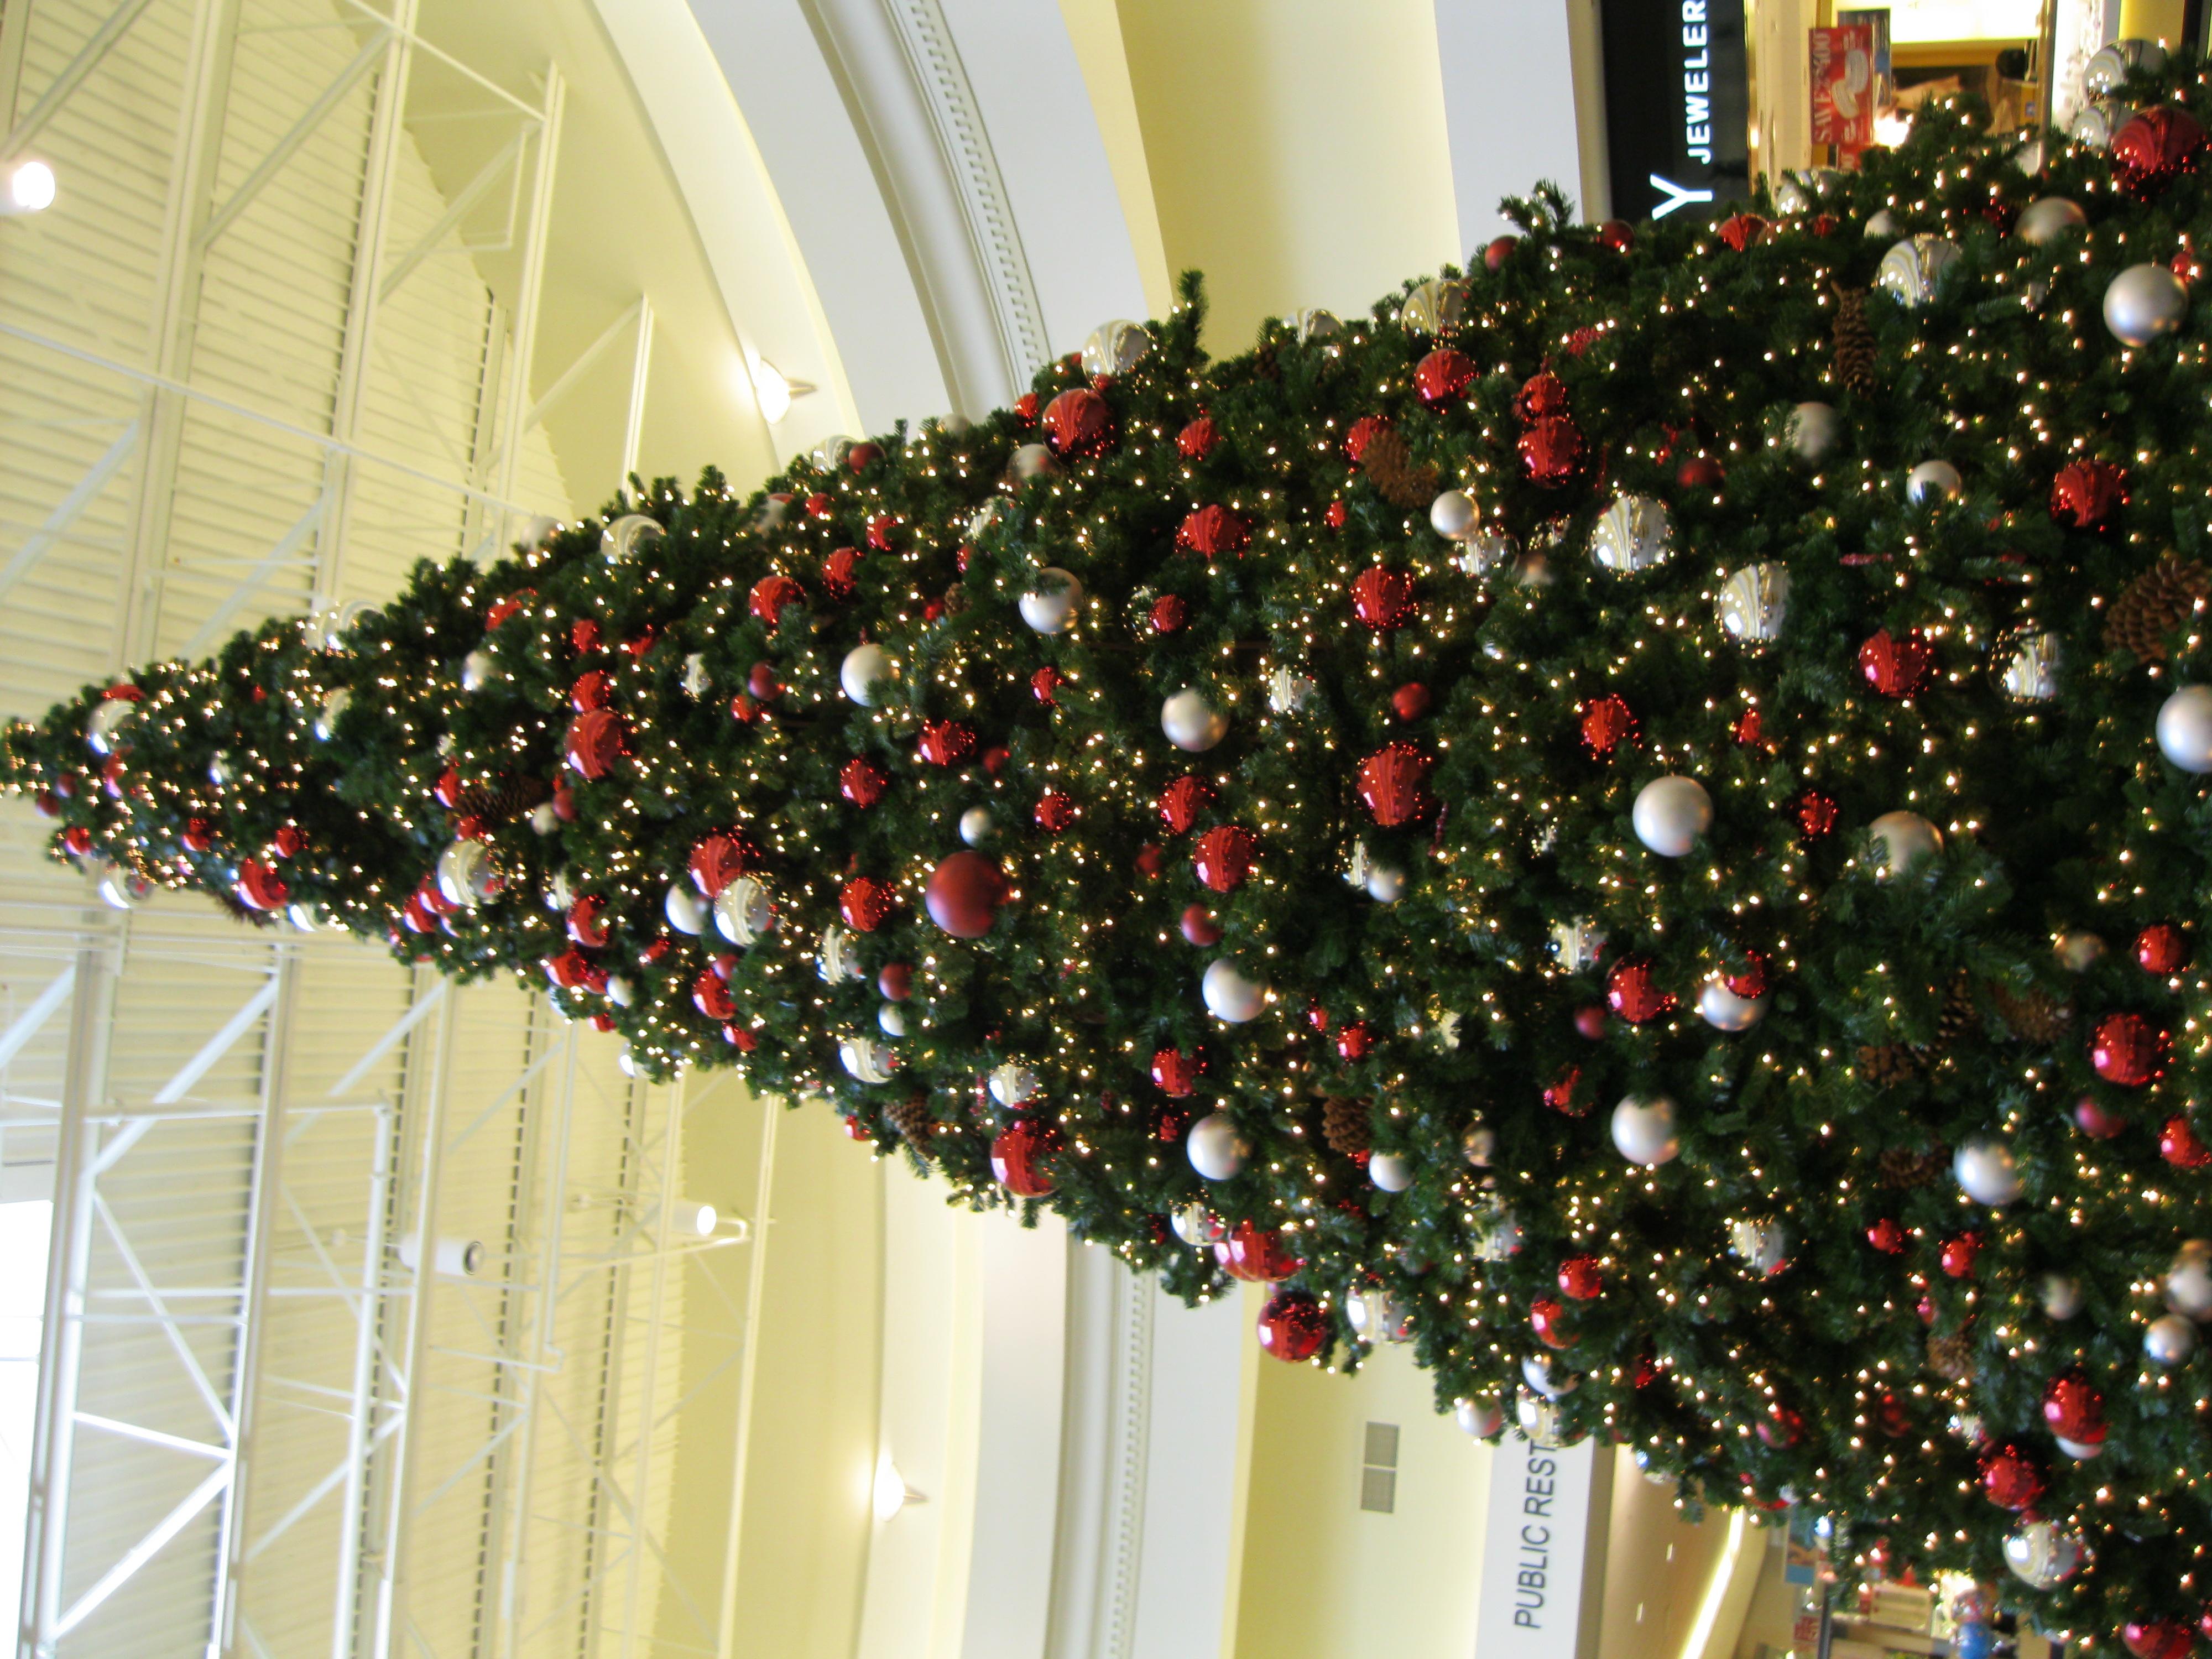 OVMall Christmas tree